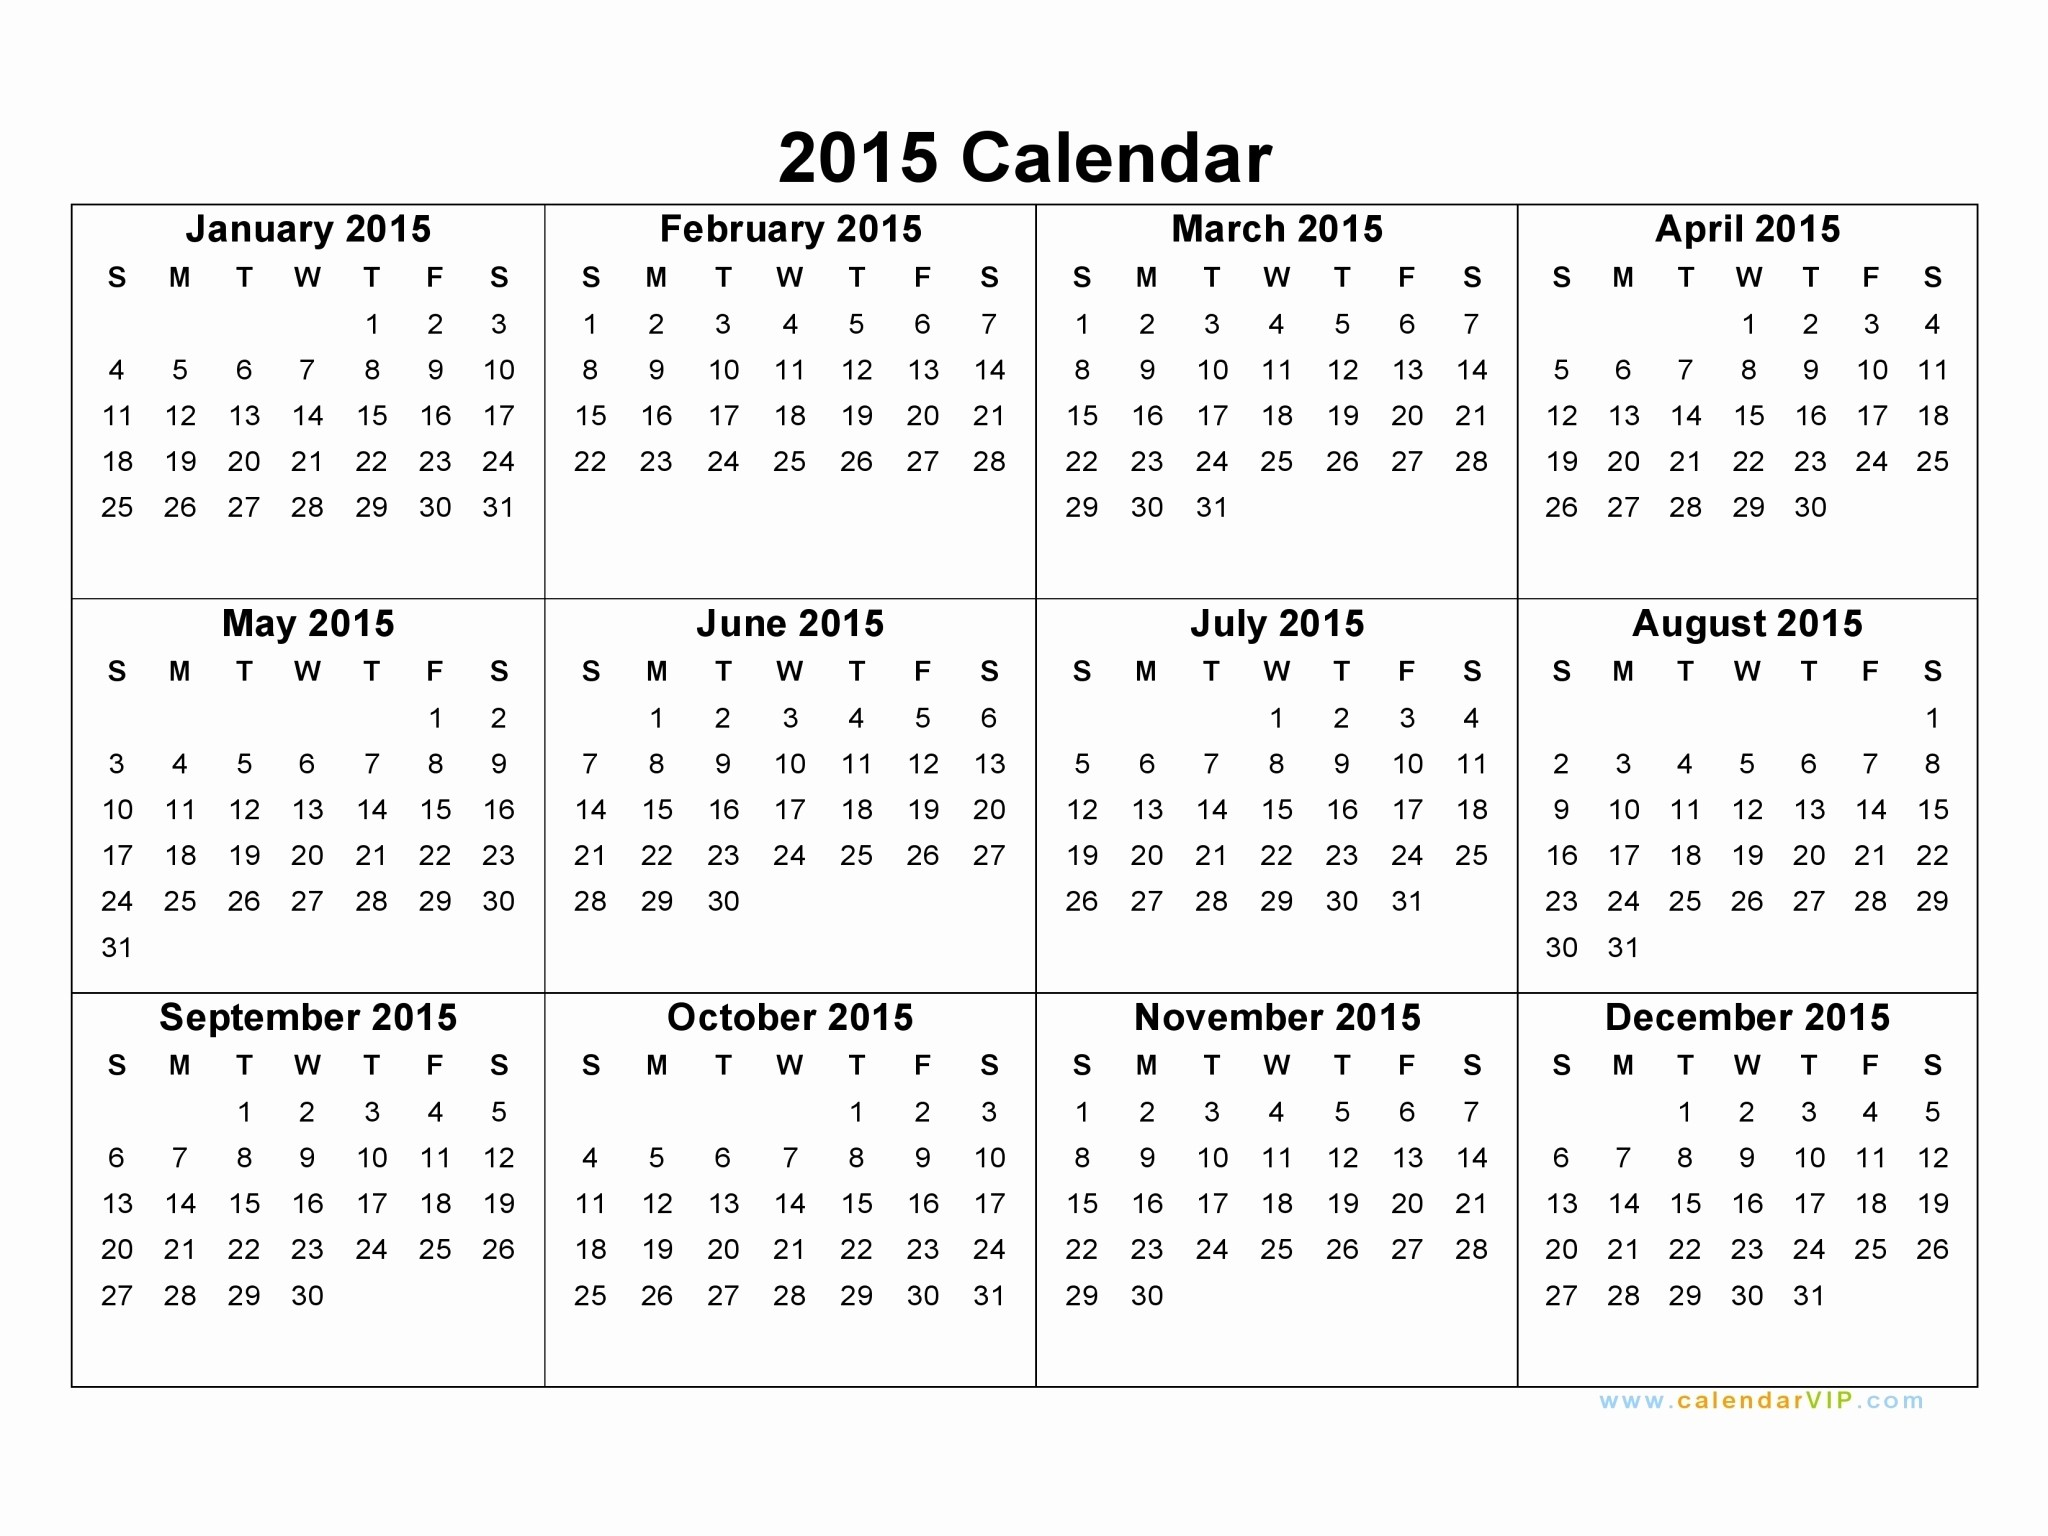 Free Printable Monthly Calendar Templates Lovely 2015 Calendar Template Beepmunk